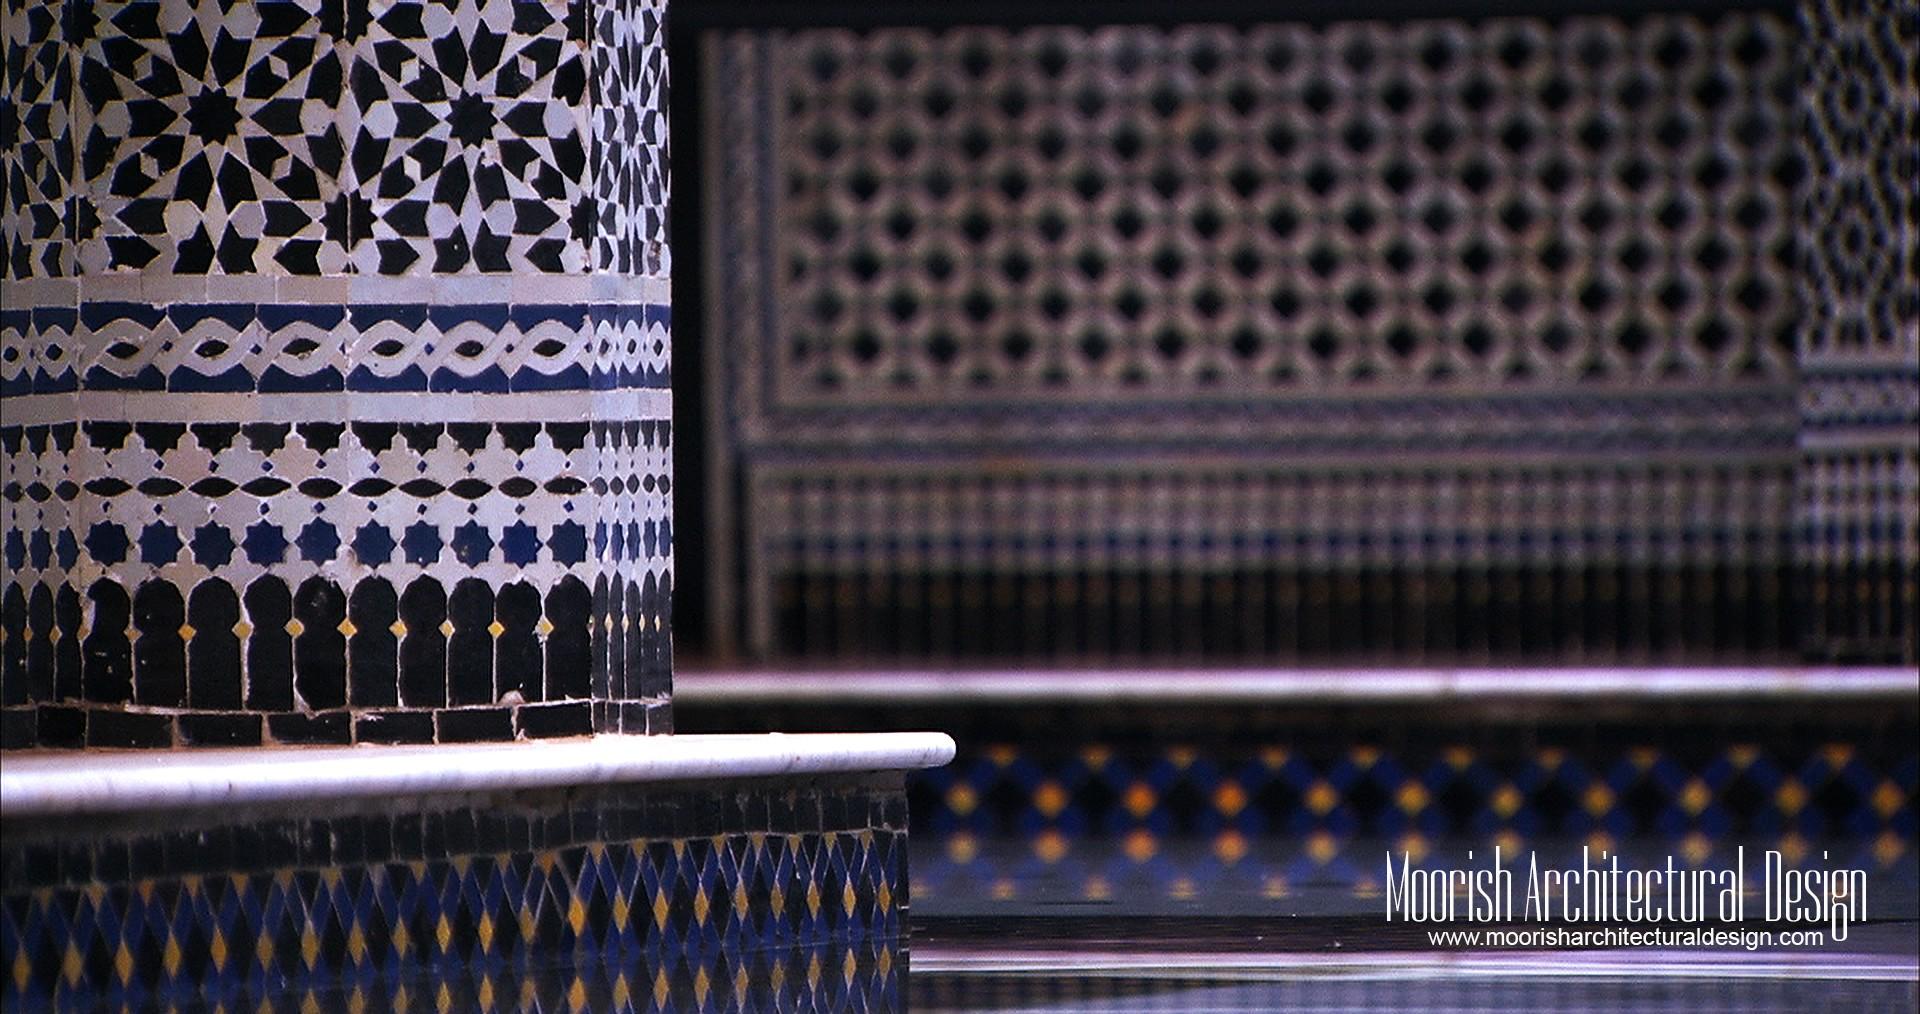 Original Moroccan Mosaic Tiles